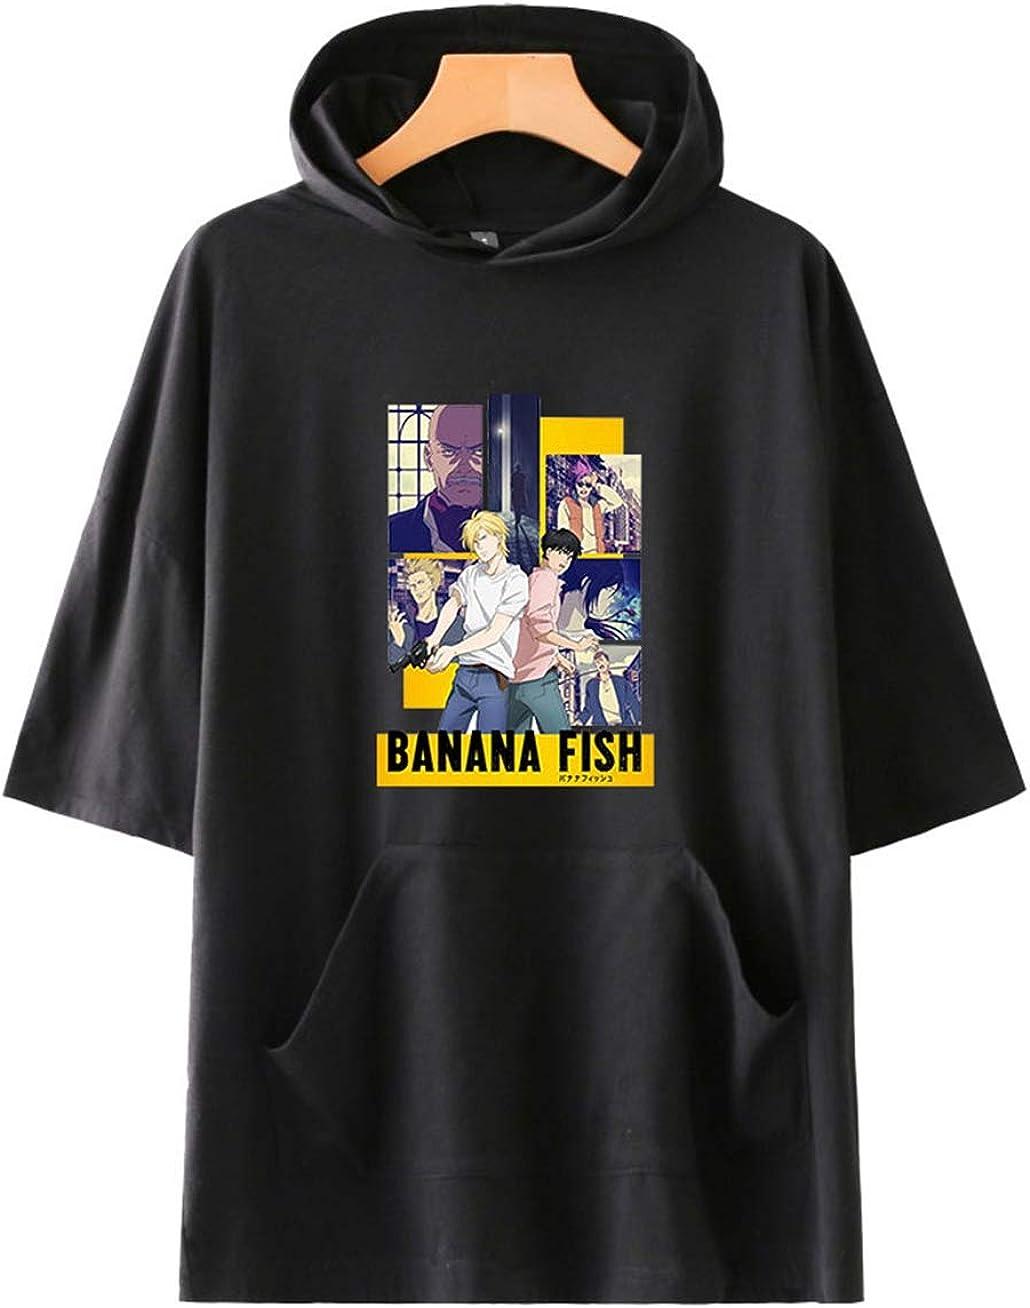 Banana Fish Camiseta con Capucha de Manga Corta Informal de algod/ón de Verano Unisex